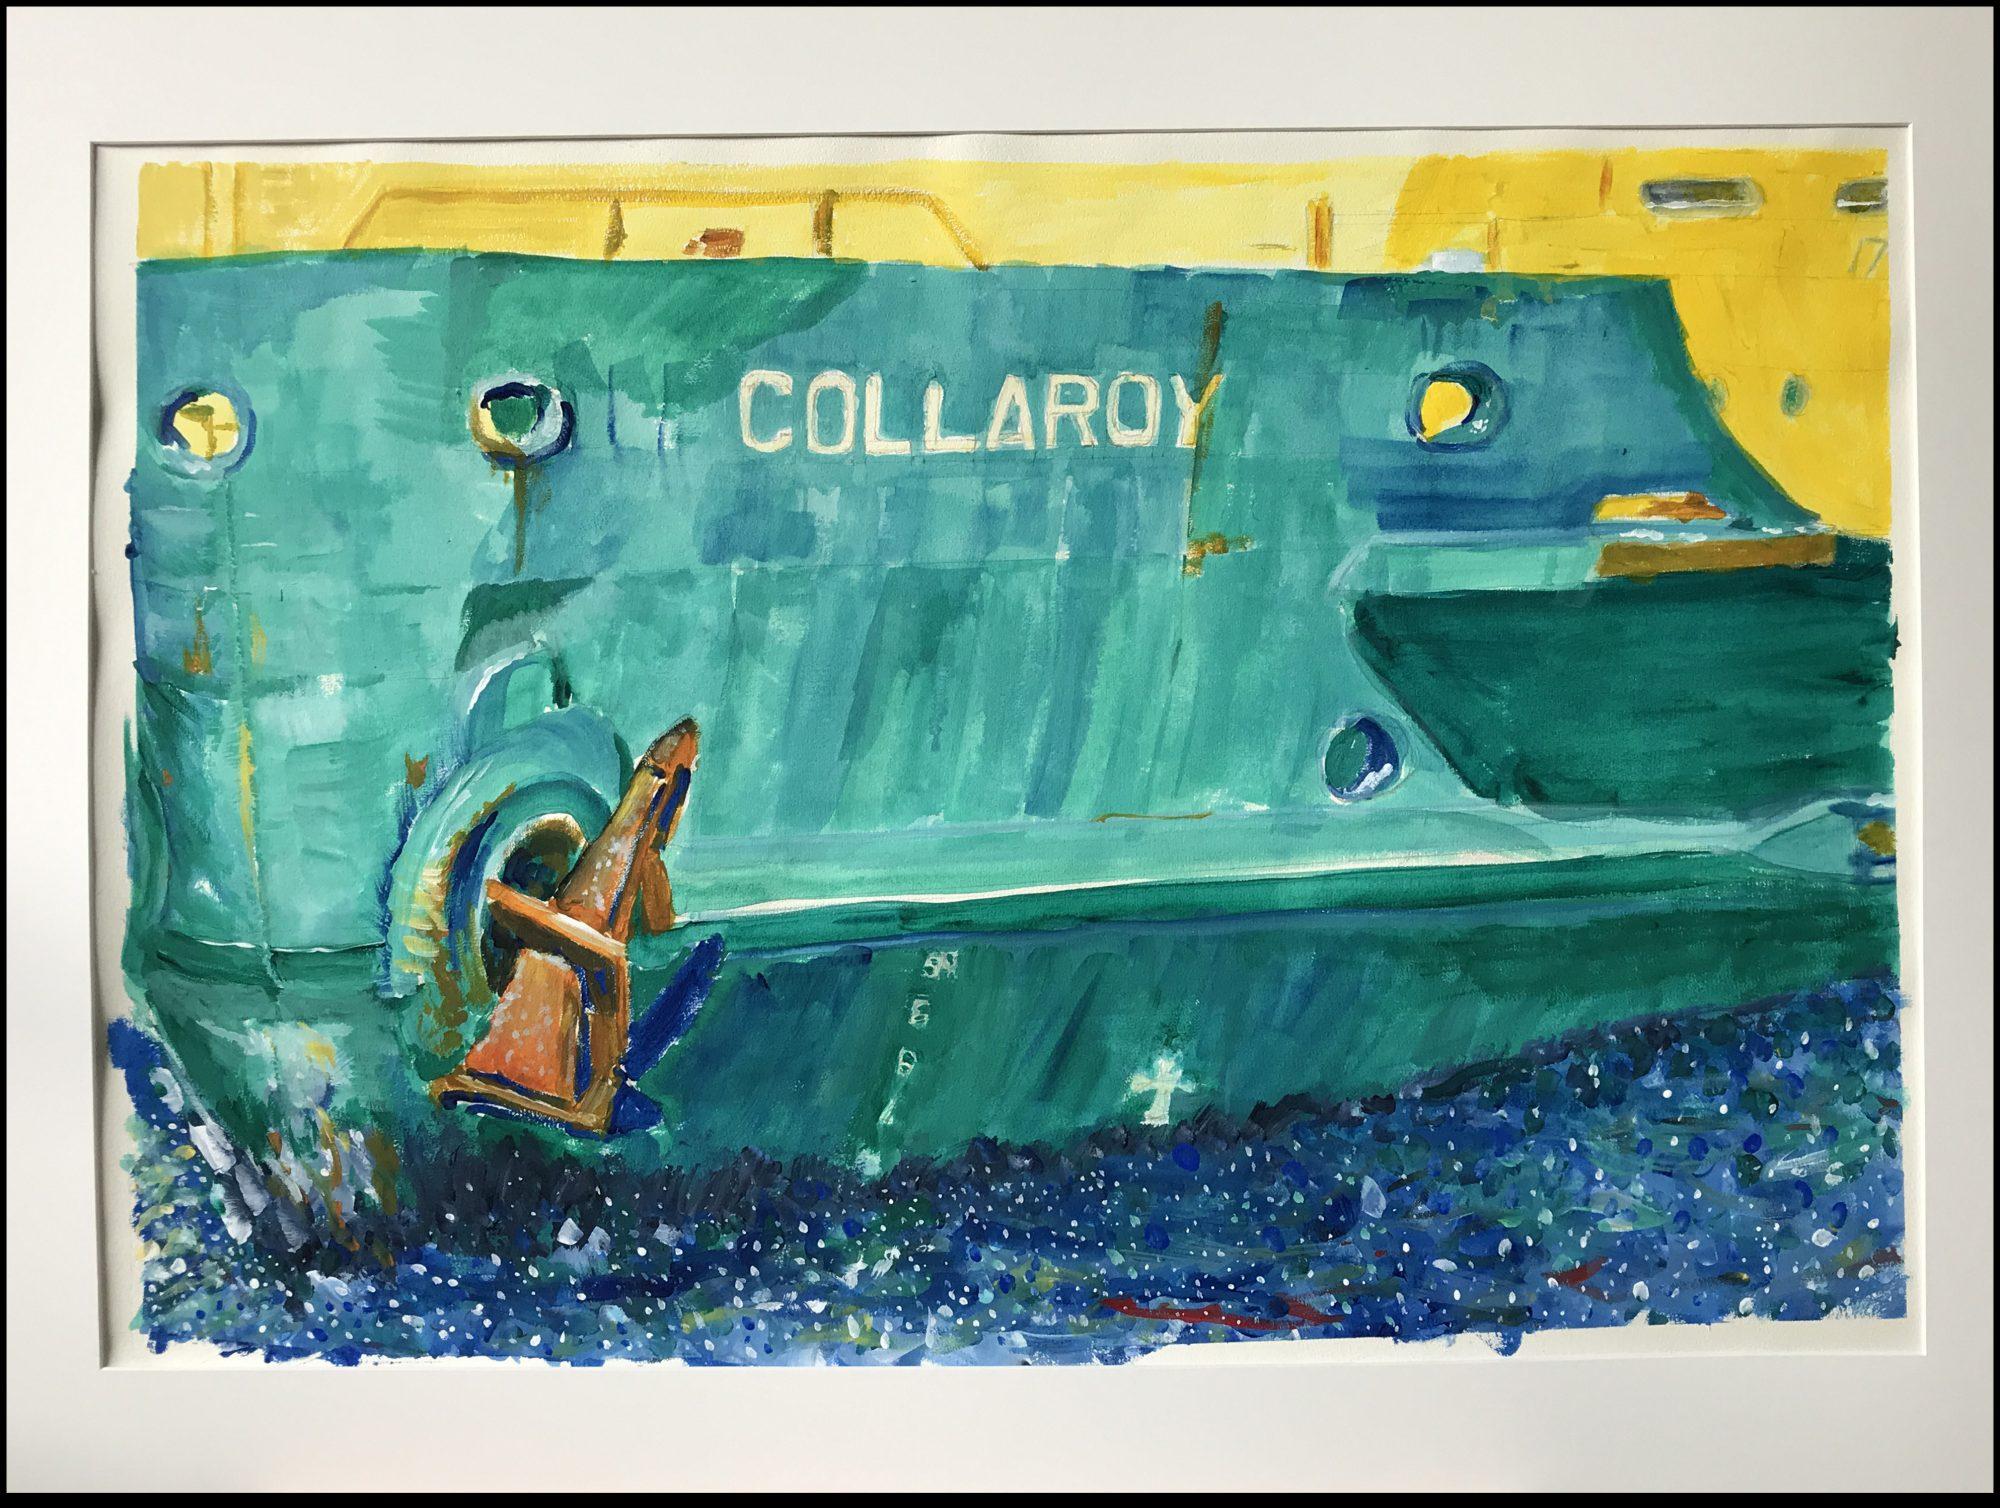 Collaroy frame